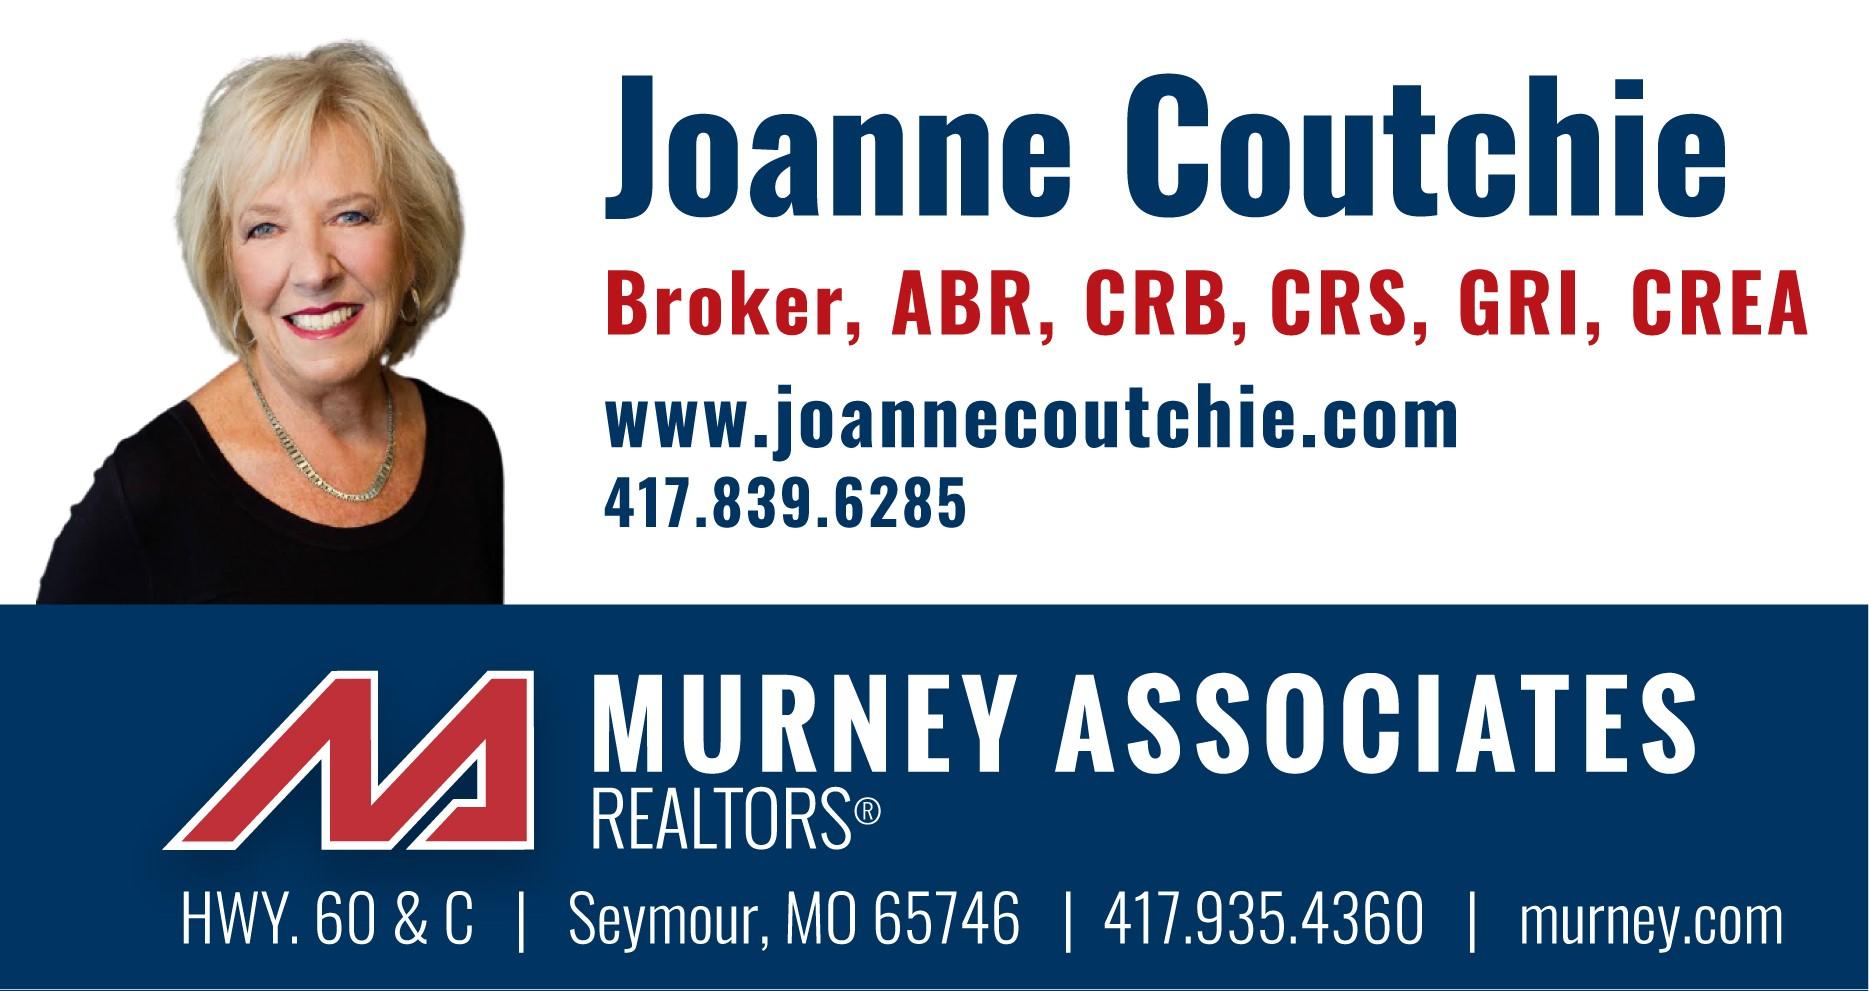 Joanne Coutchie, Broker Suburban Office Murney & Associates REALTORS